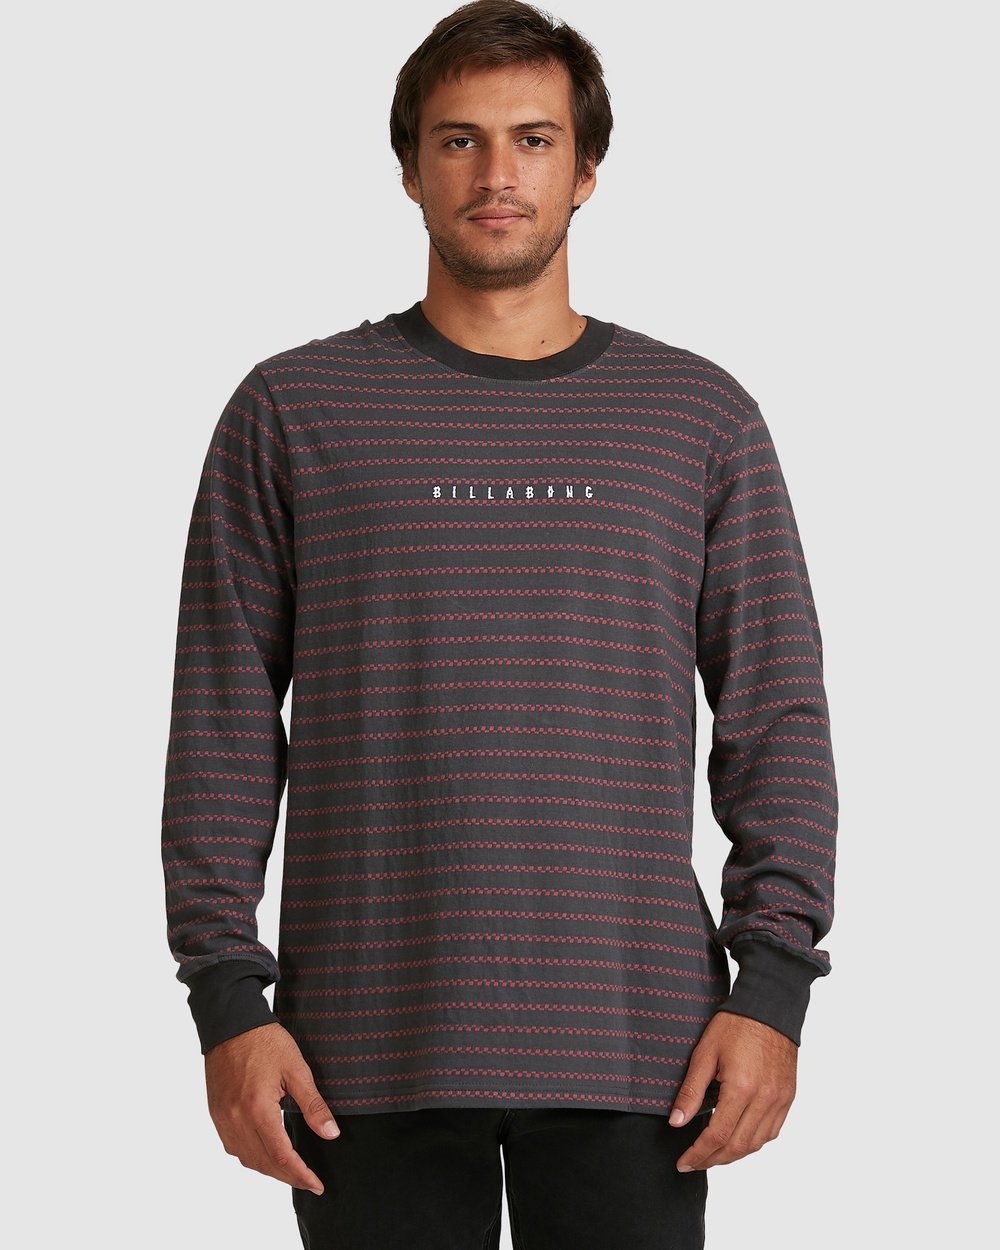 Billabong - Cish Cash Stripe Long Sleeve - T-Shirts & Singlets (ROSE DUST) Cish Cash Stripe Long Sleeve